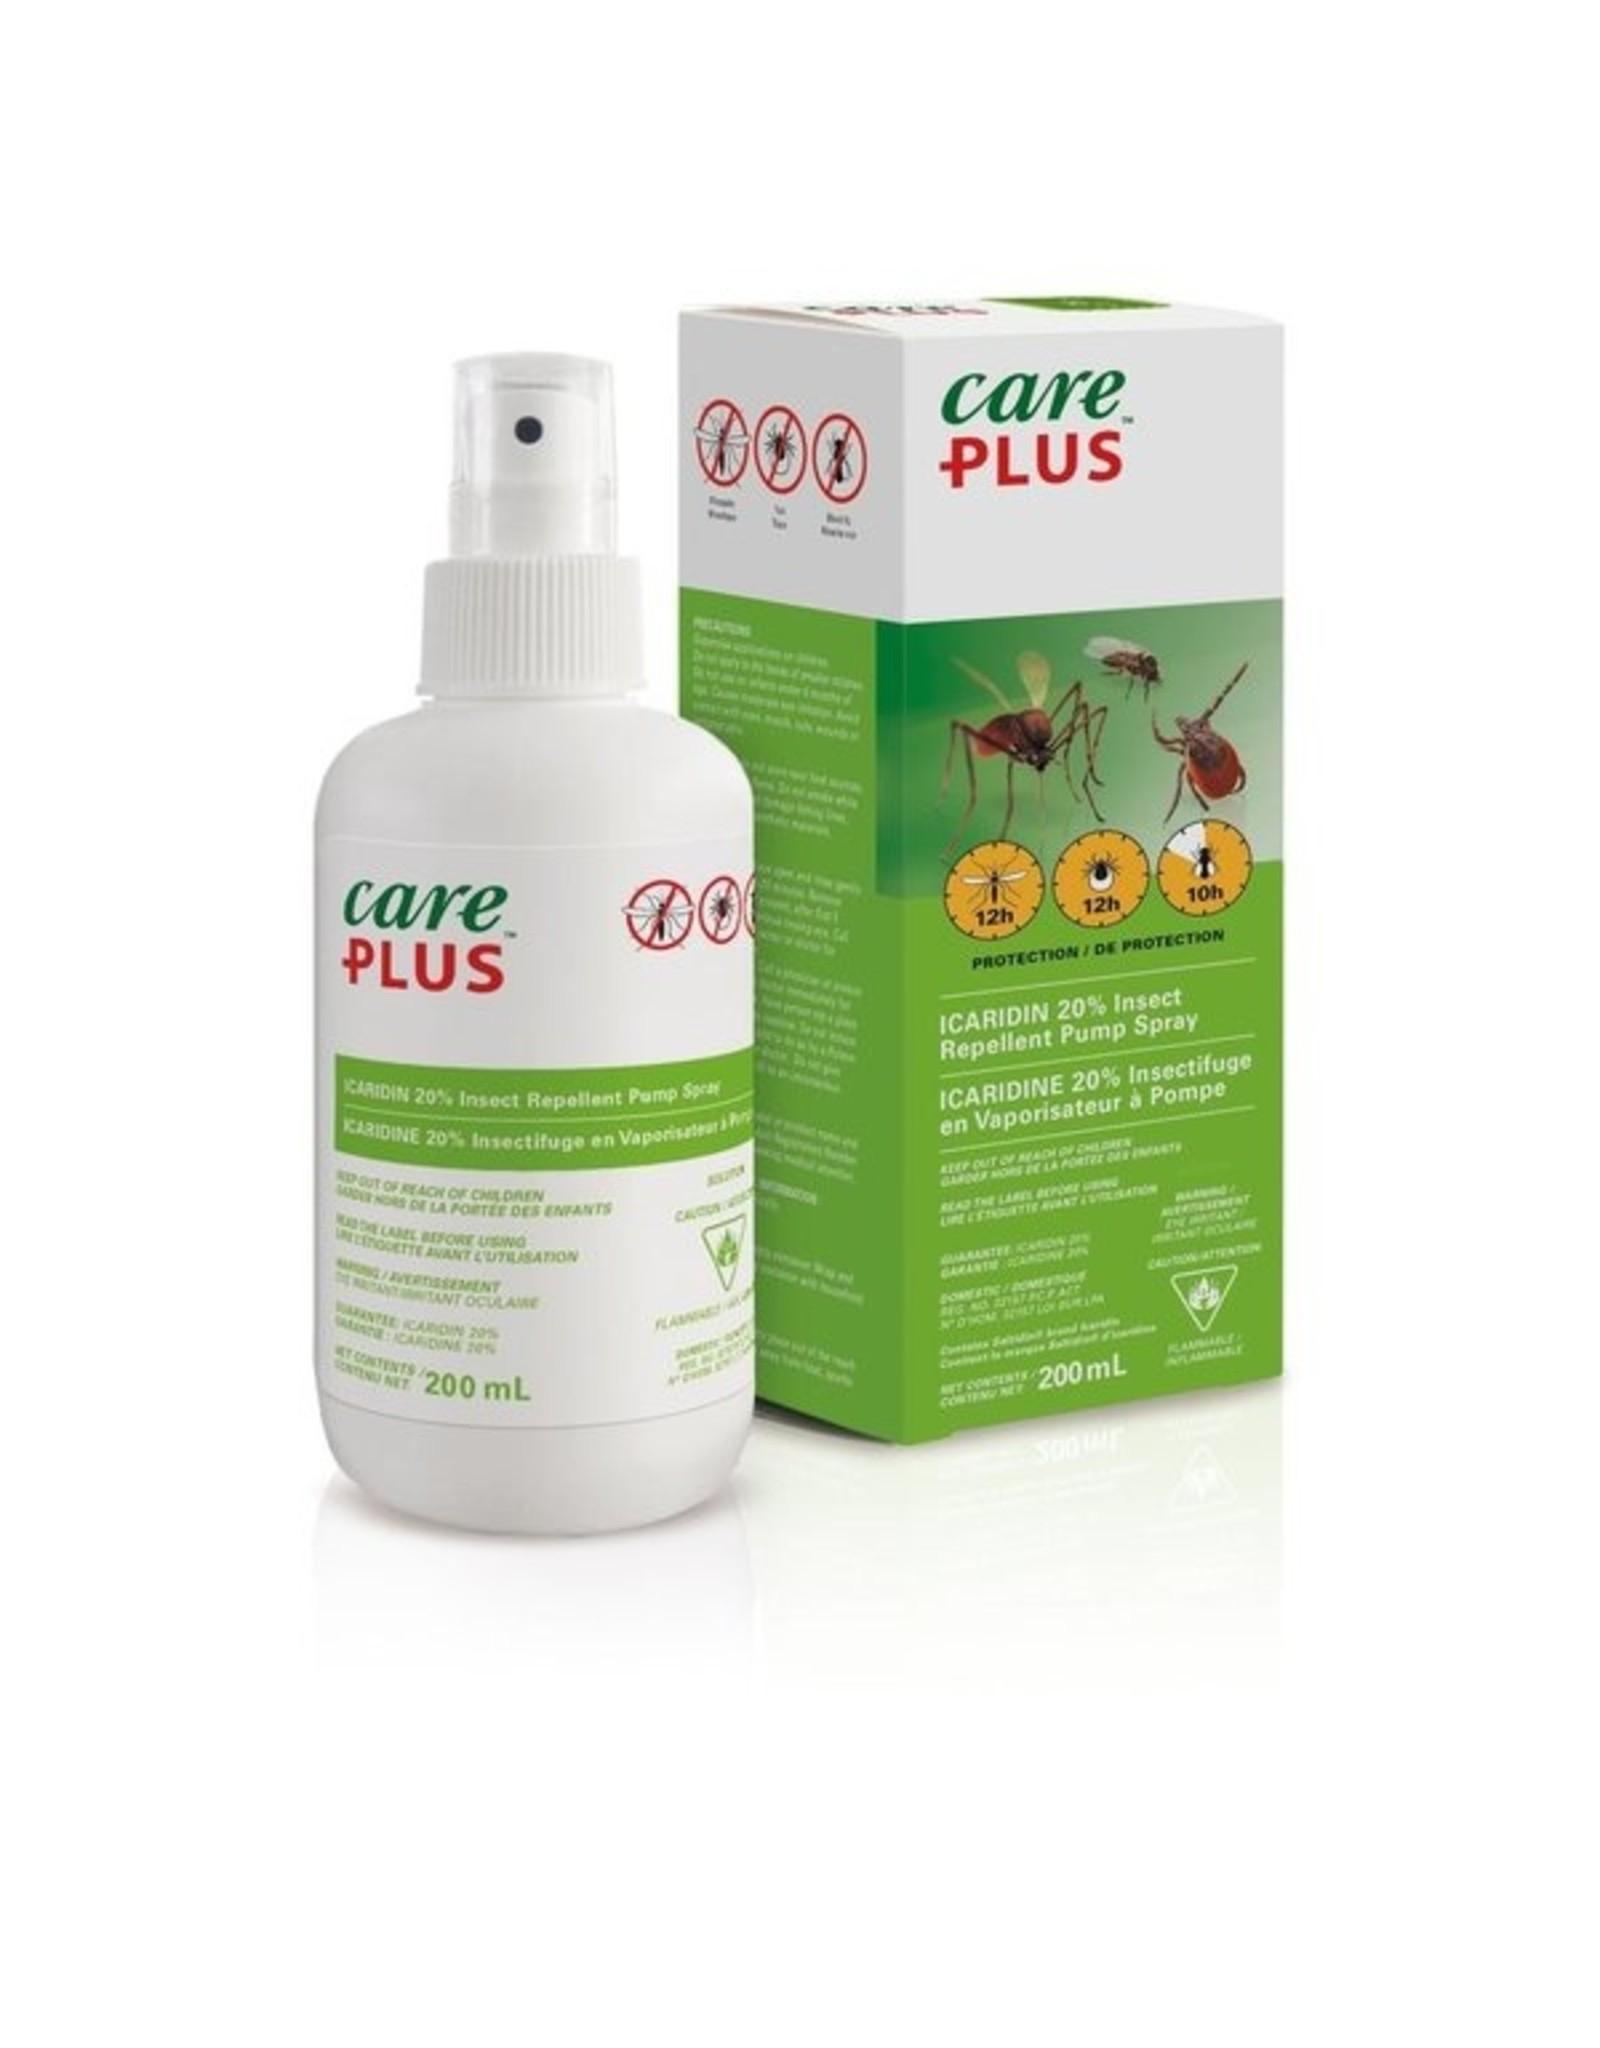 Care Plus Care Plus Insect Repellent 200ml